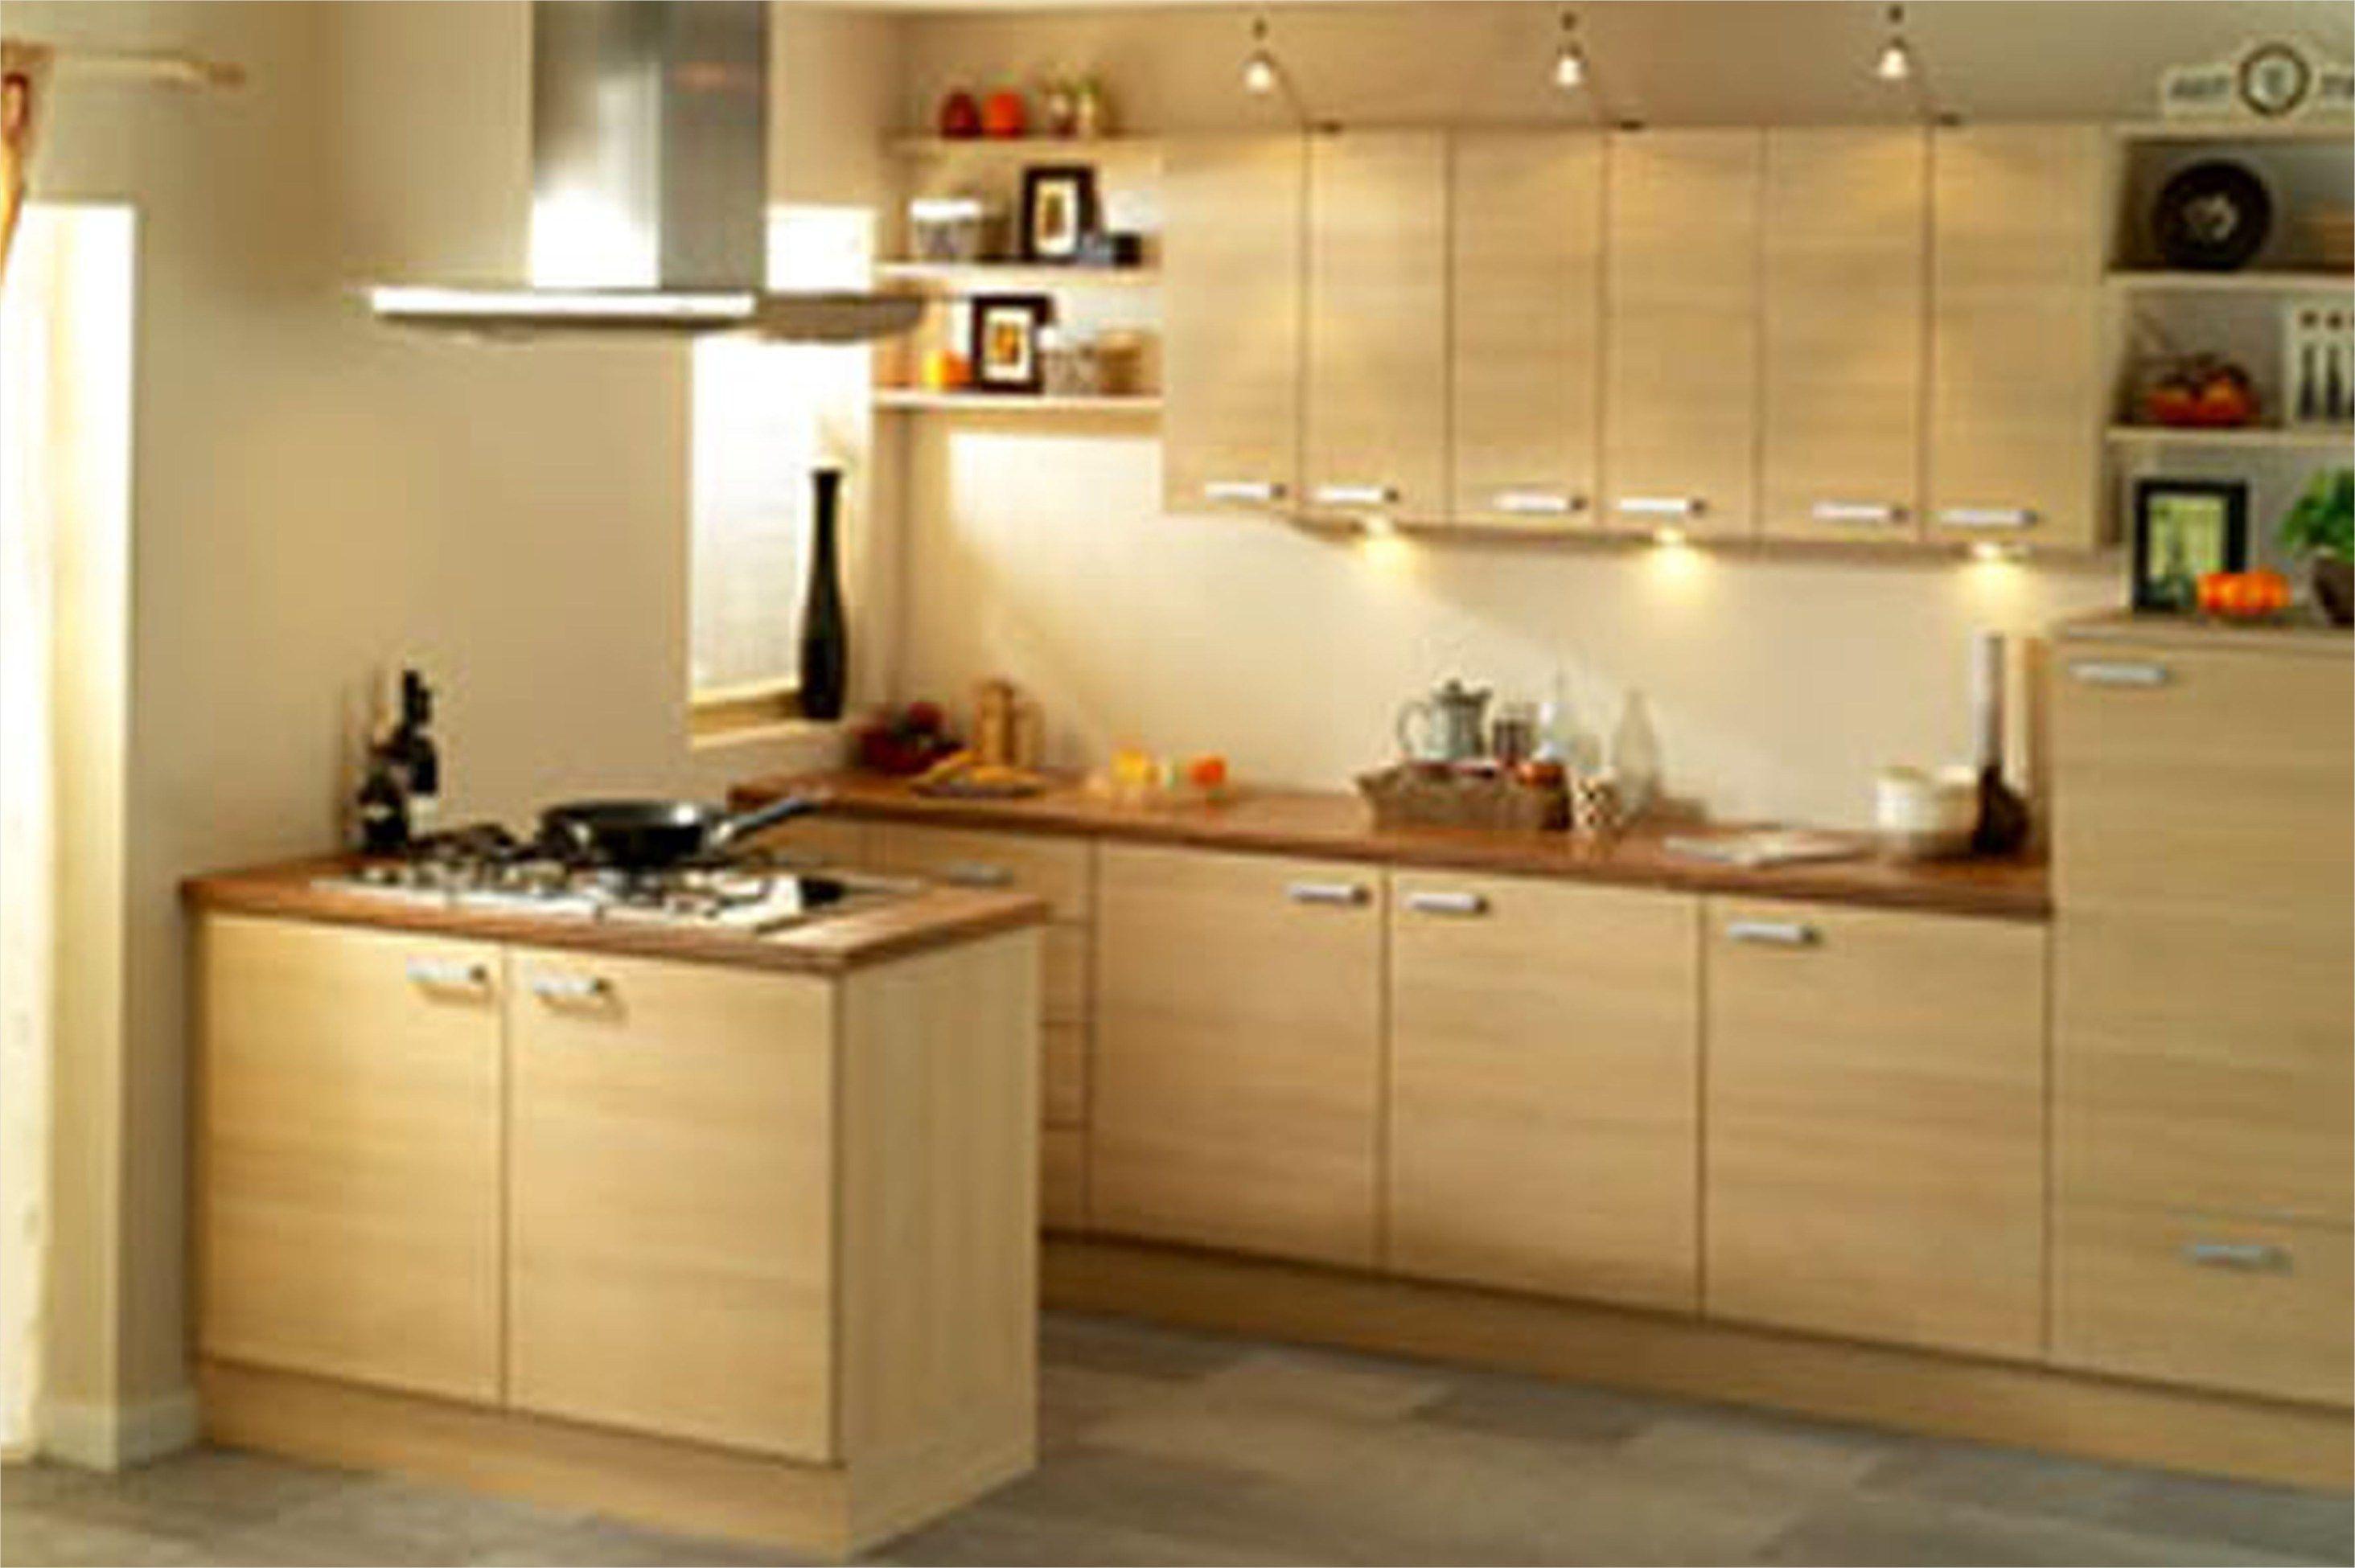 Small Kitchen Remodel Ideas Decorecent Simple Kitchen Design Small Kitchen Decor Tiny House Kitchen